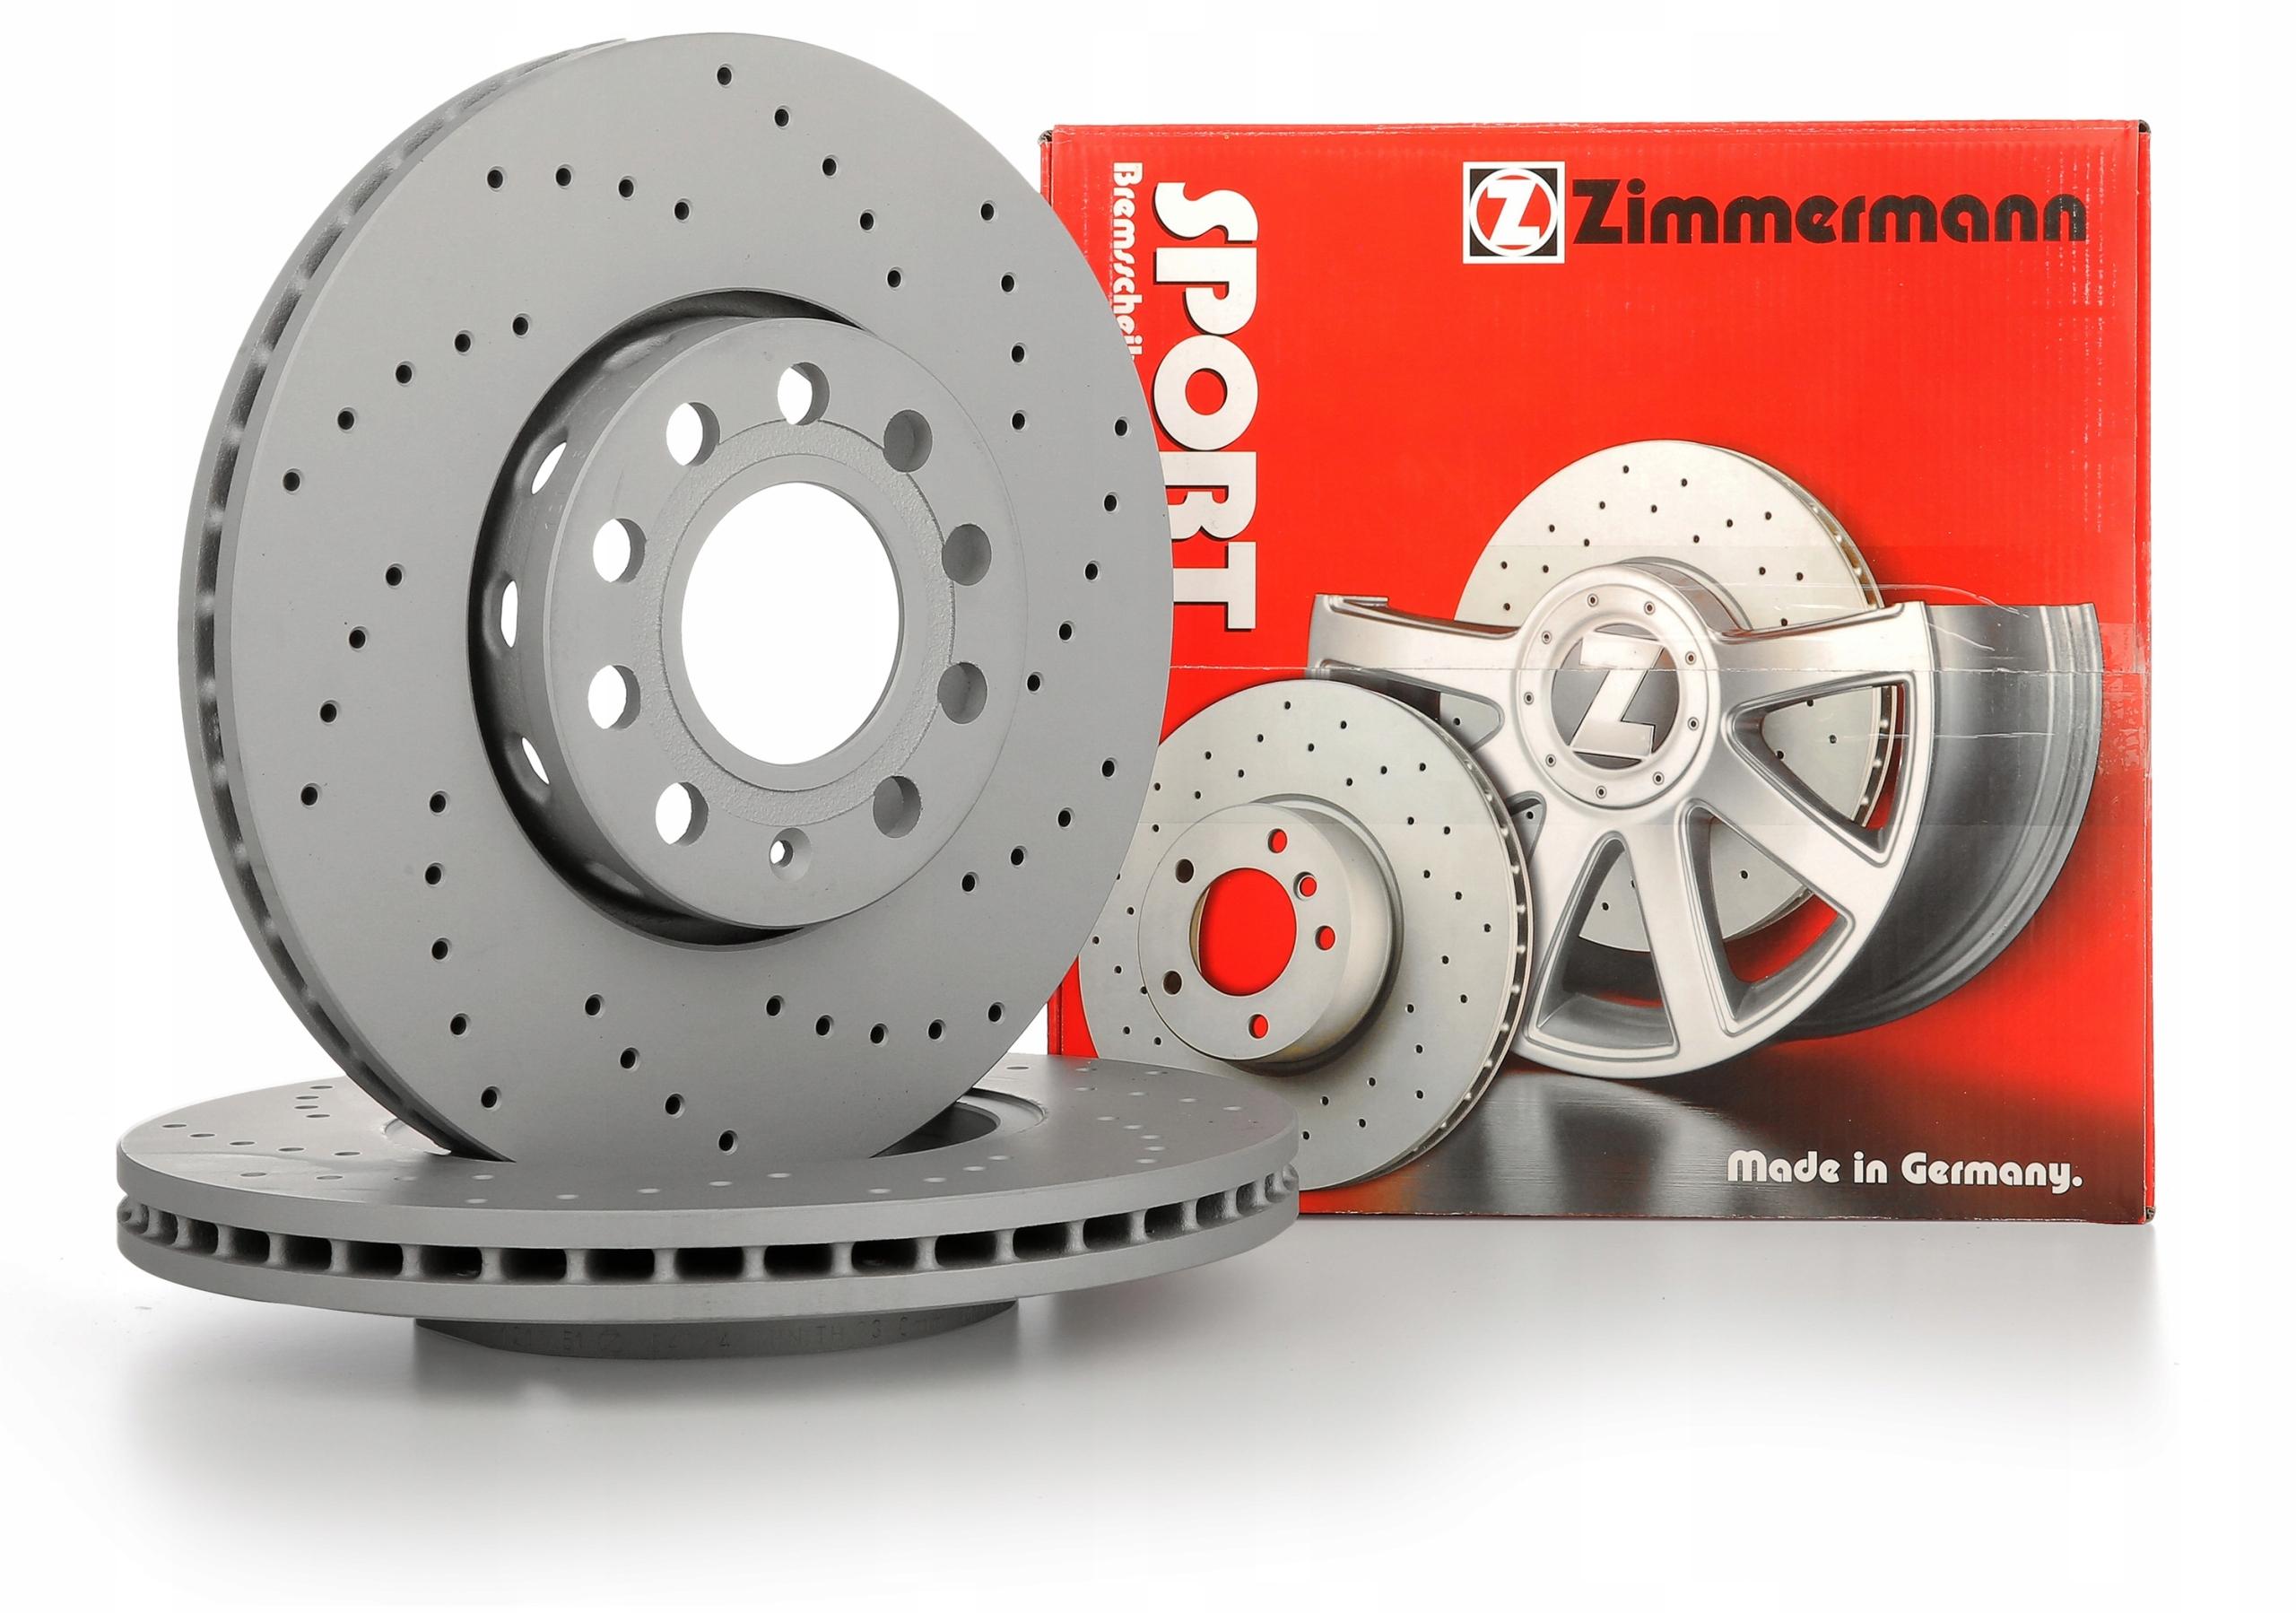 диски zimmermann спорт вперед - bmw 3 e46 325mm